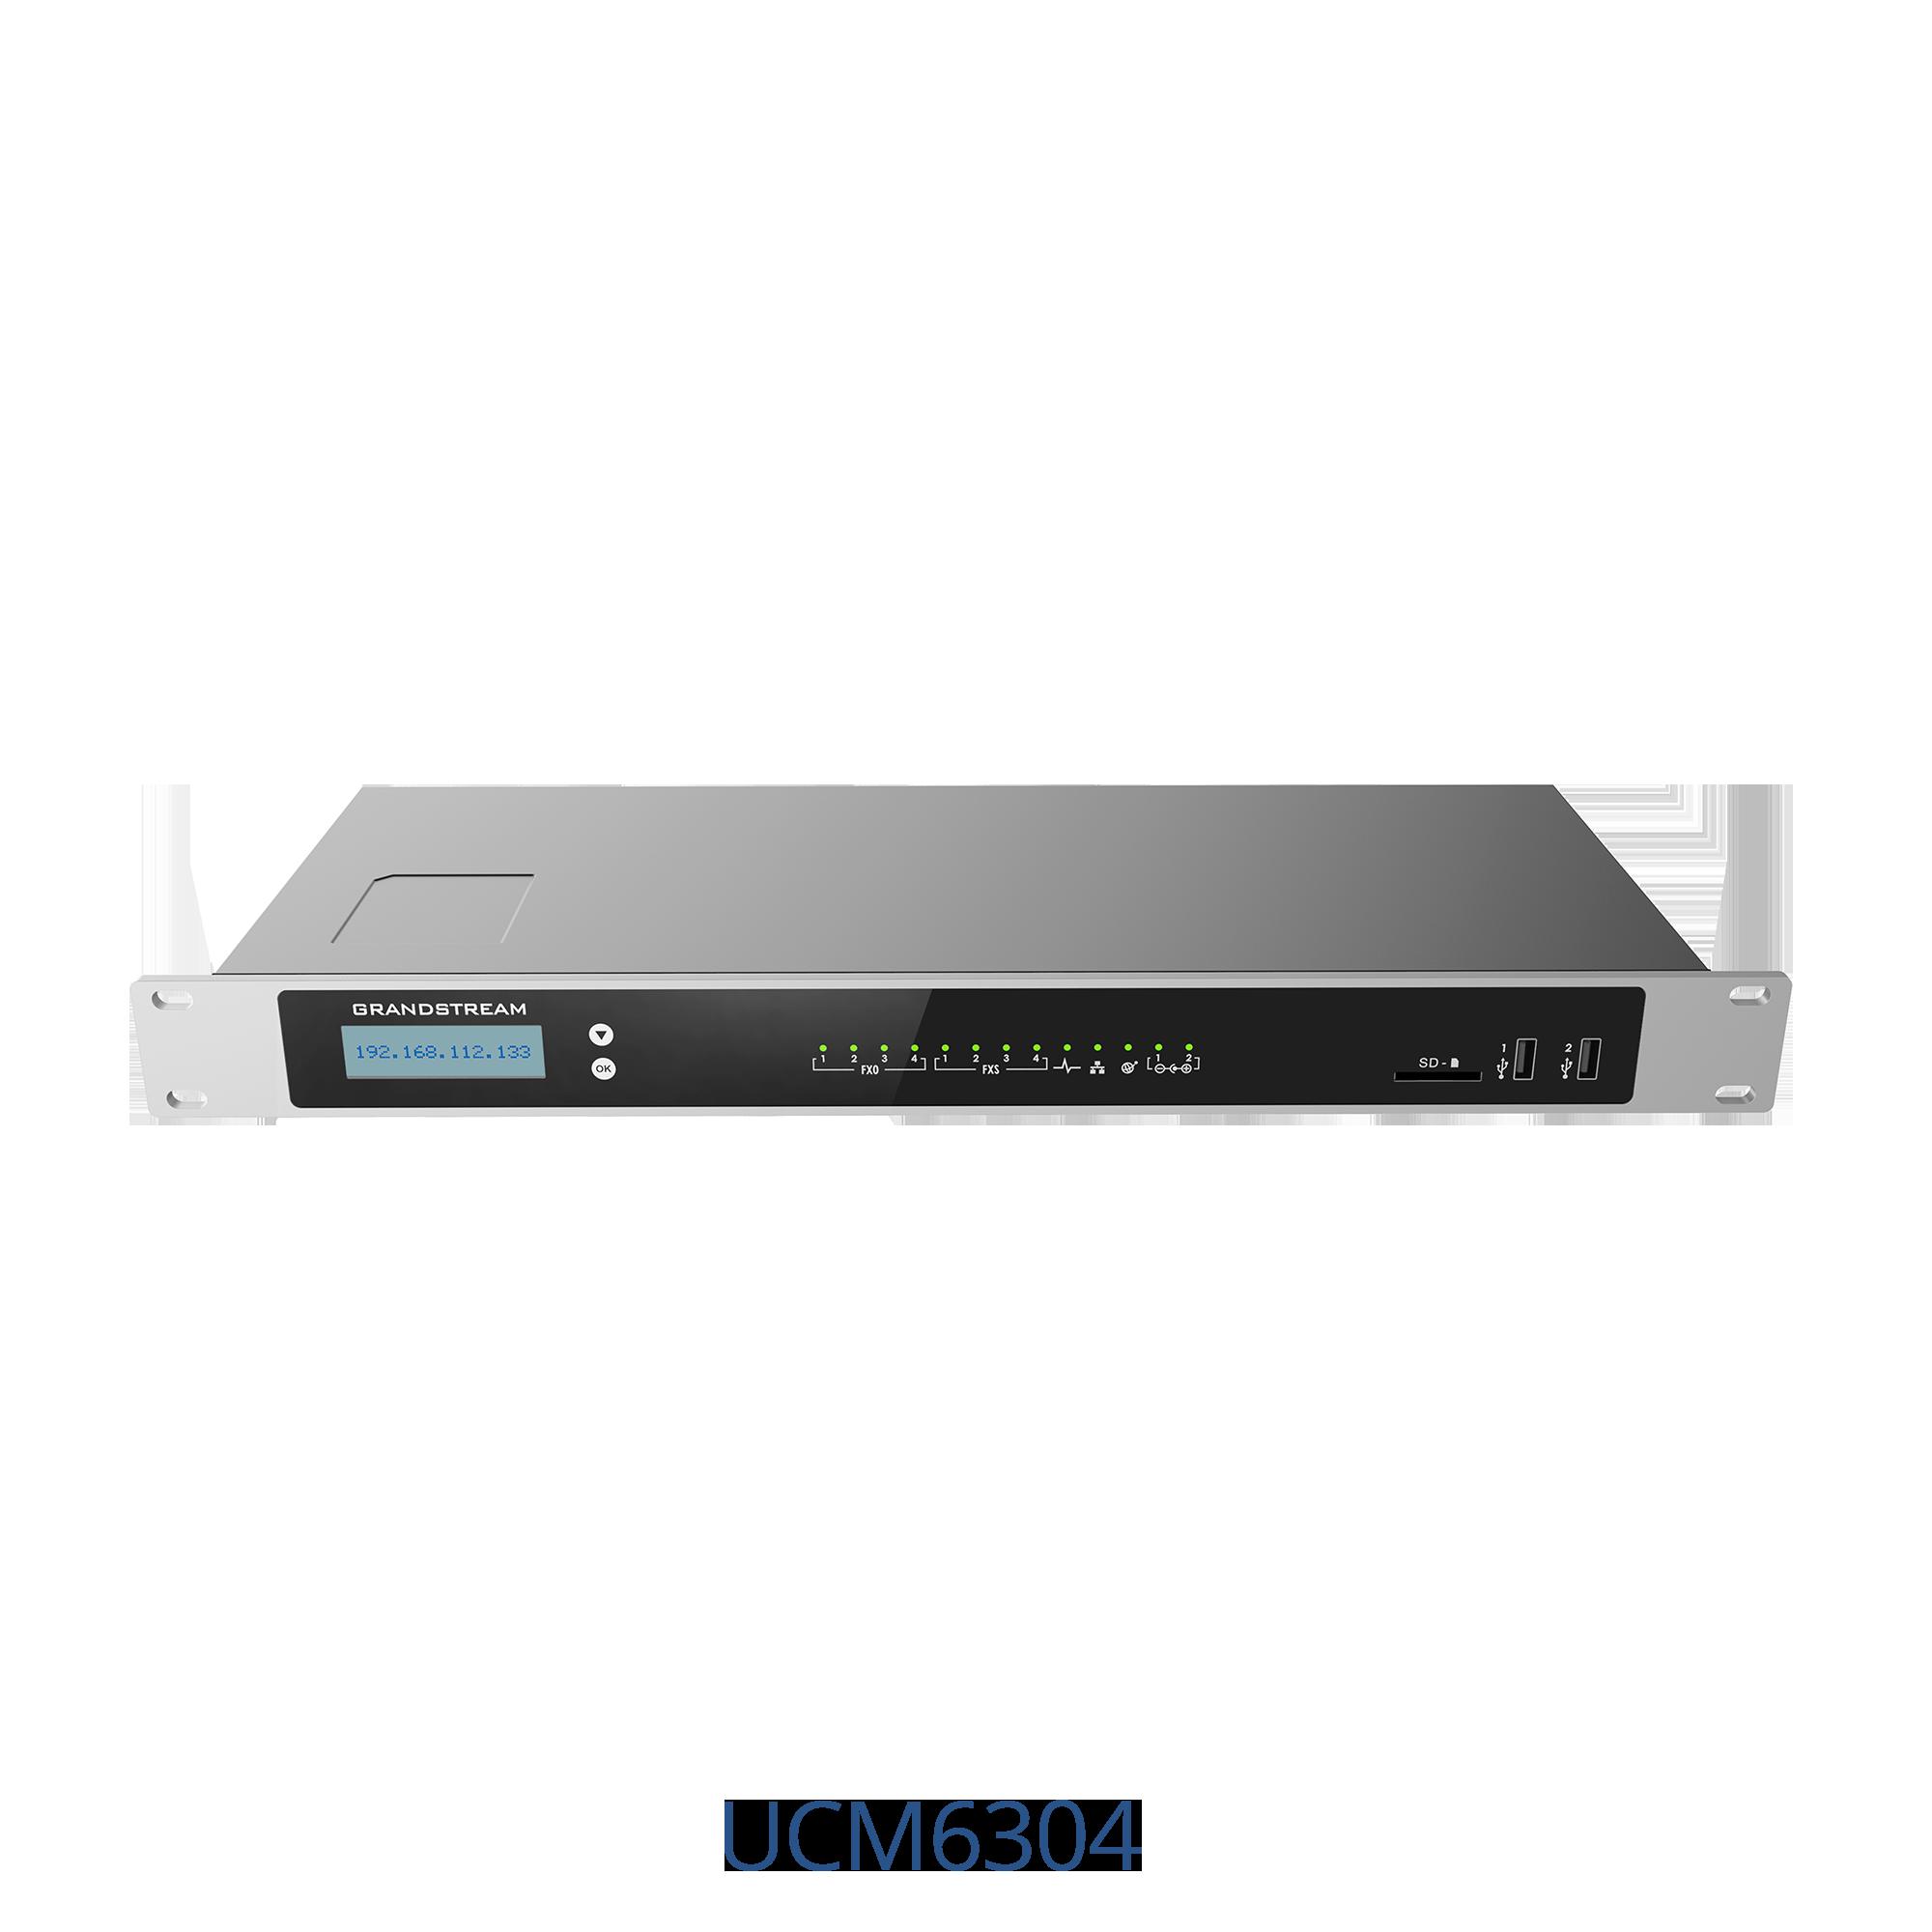 UCM6304